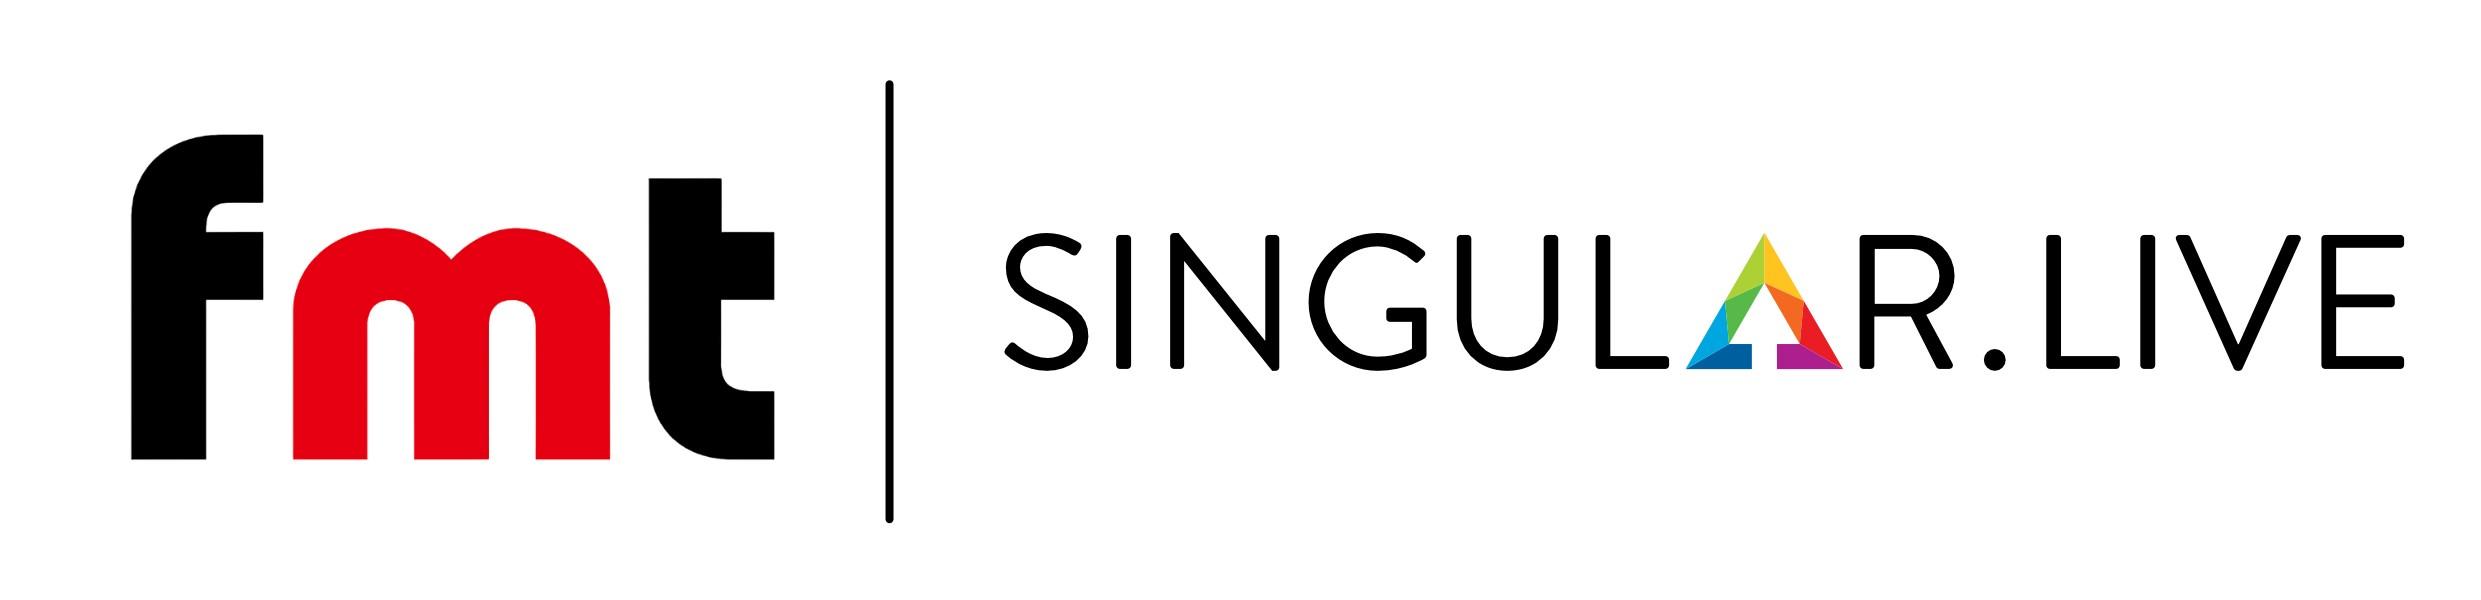 fmt・Singular2